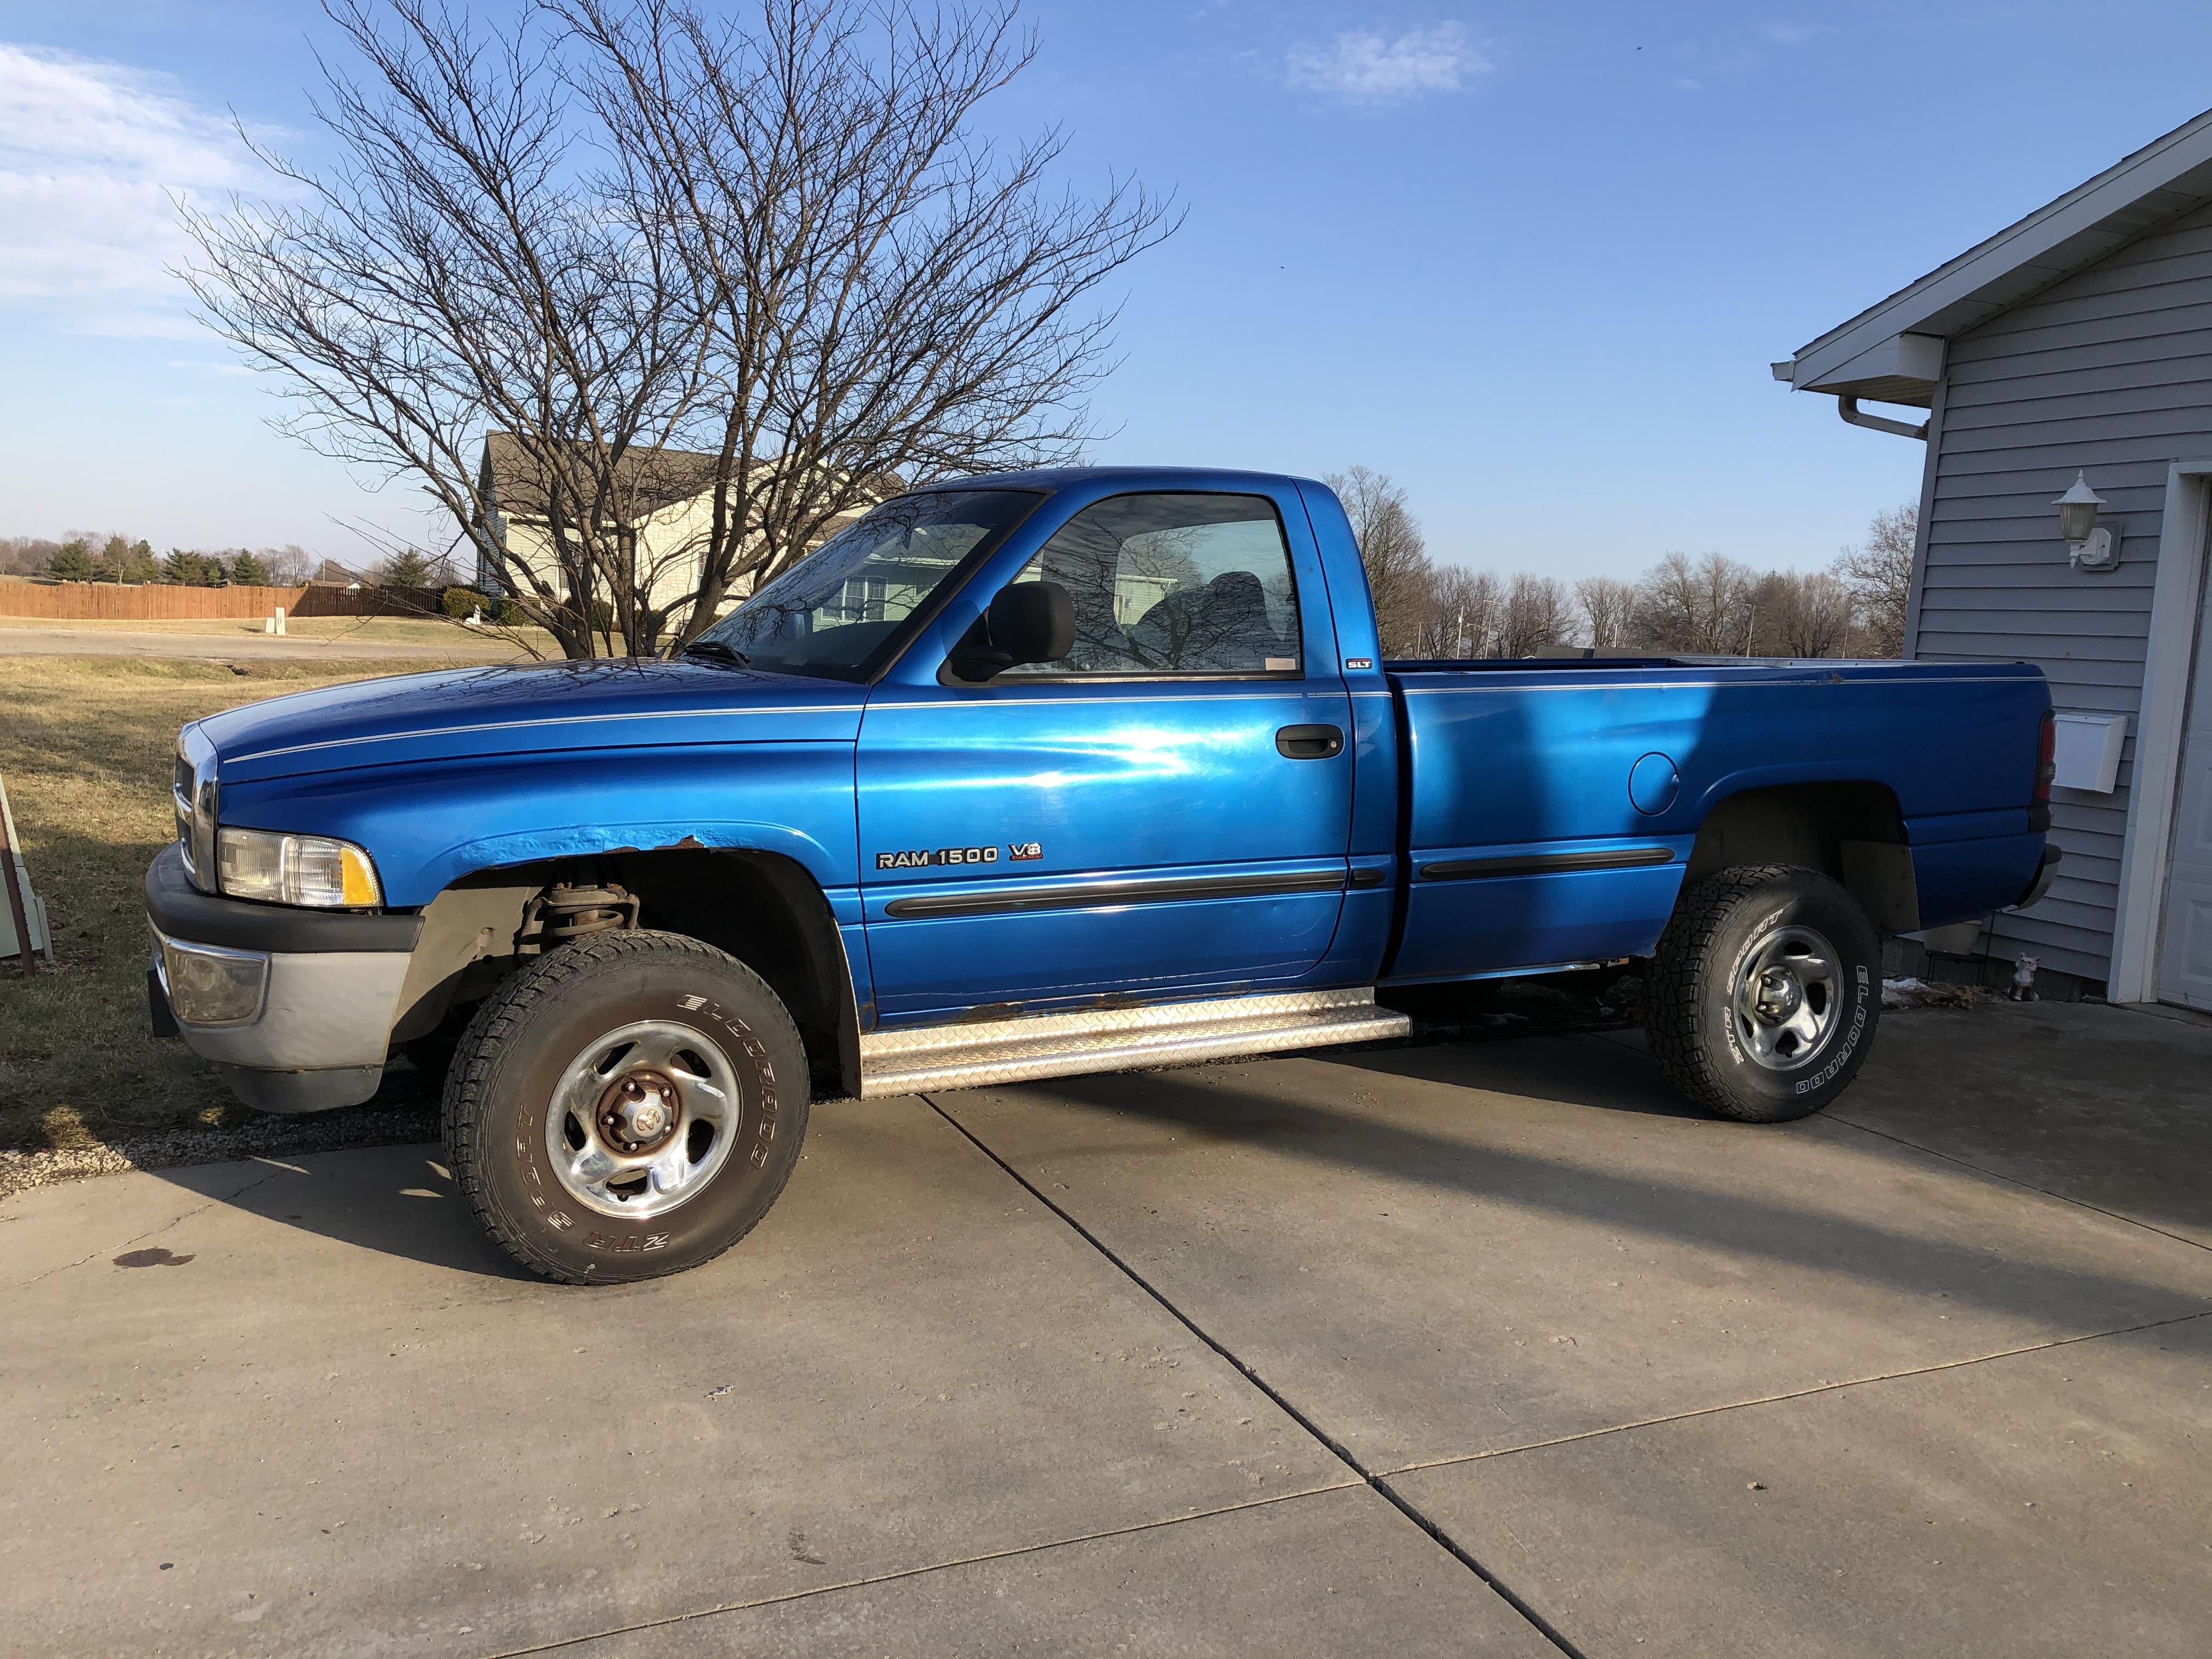 Lot 28 - 1998 Dodge Ram 2500 Pickup Truck, 4x4, Gas Motor (Blue)